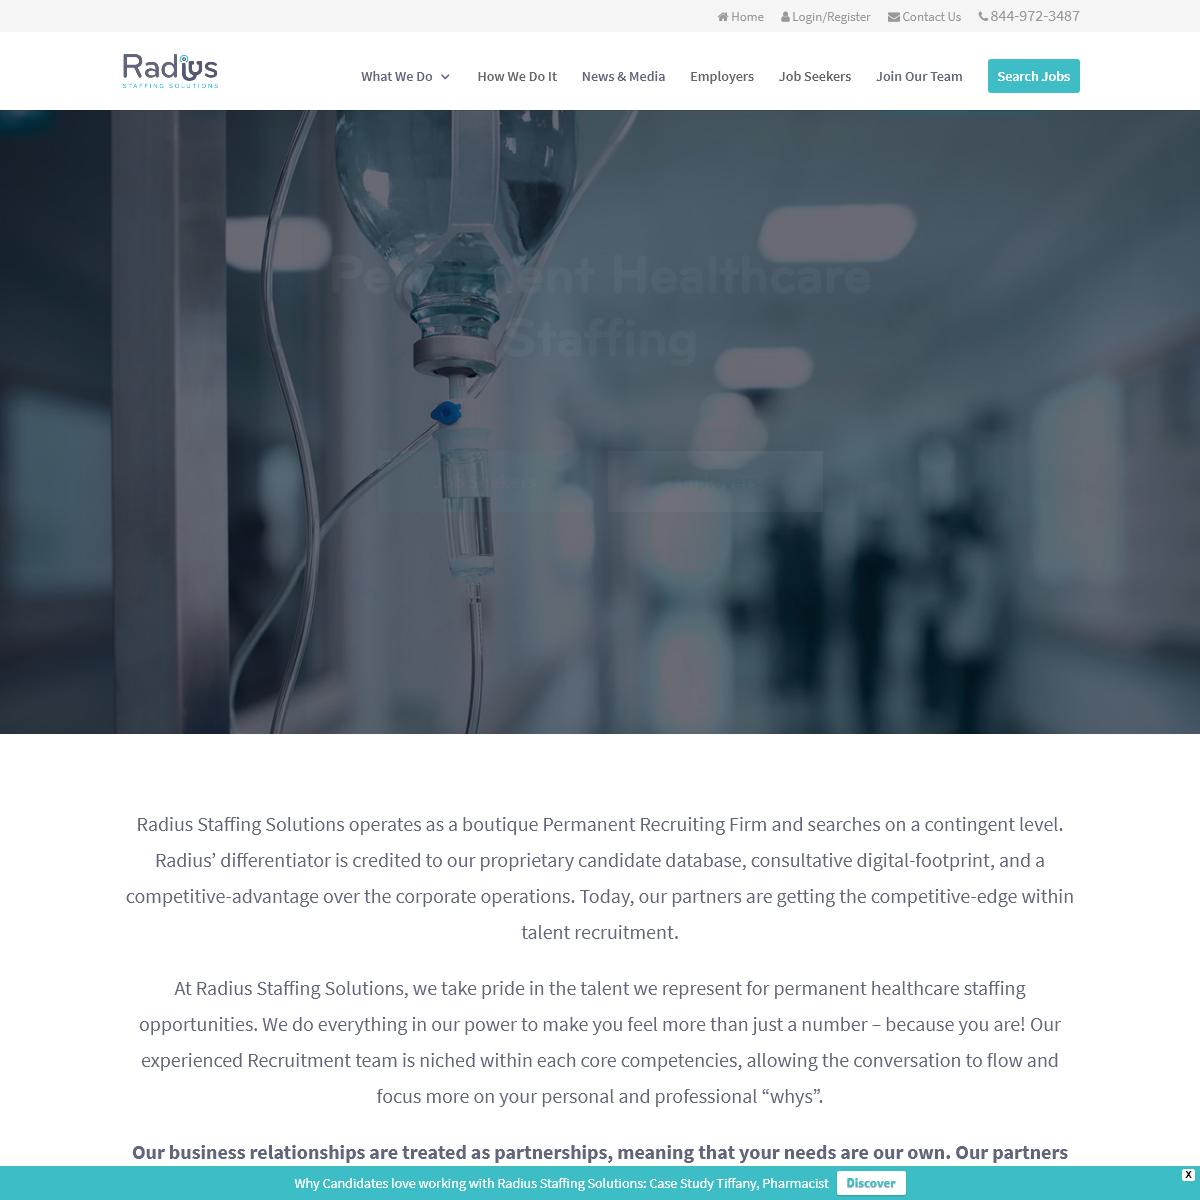 Radius Staffing Solutions - Permanent Healthcare Staffing